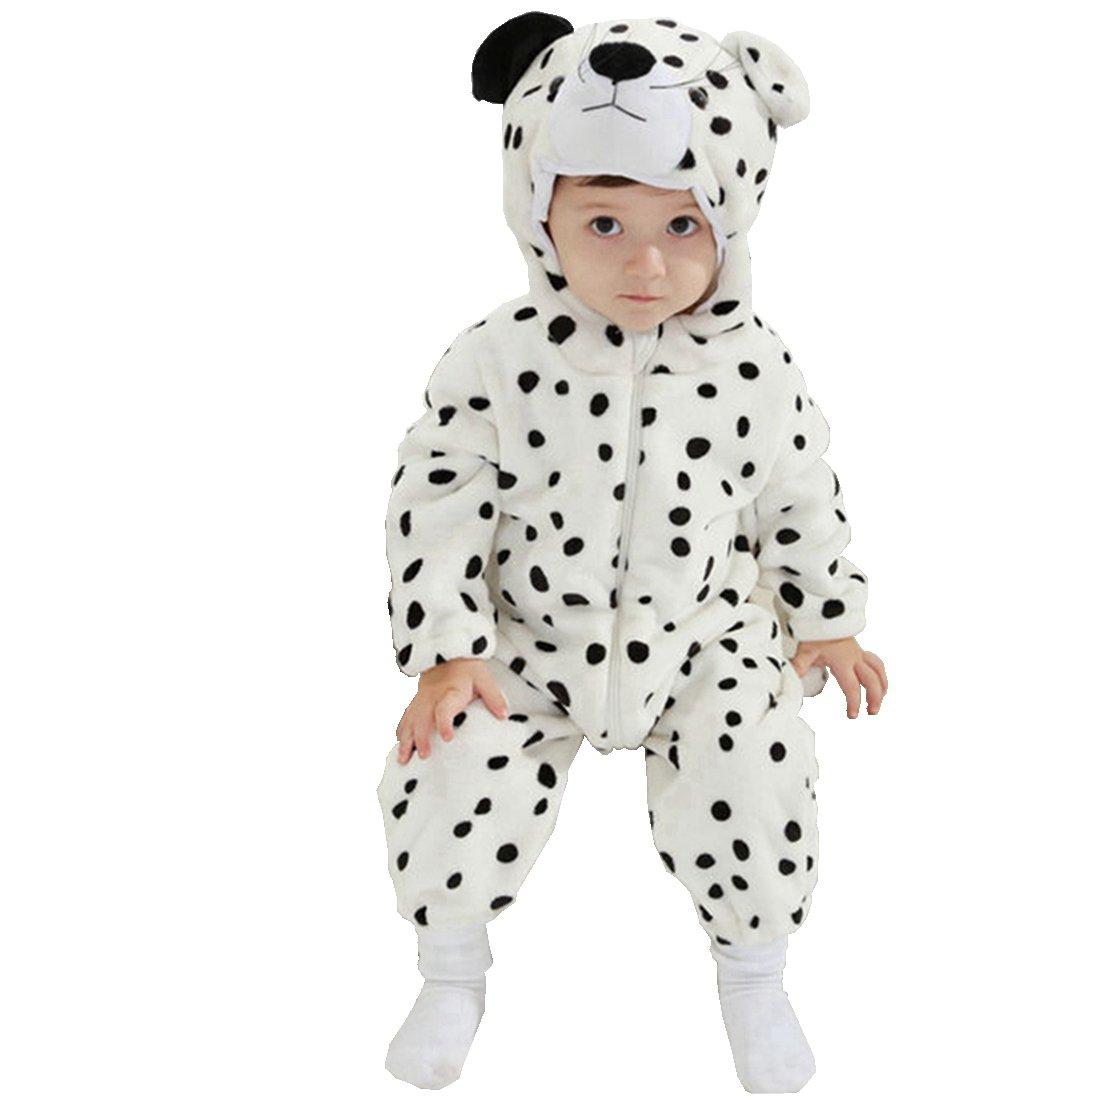 IFLIFE Bebé Kigurumi Pijamas Pelele Animal Mono para Niño Niña Infantil, Ropa de Noche con Capucha